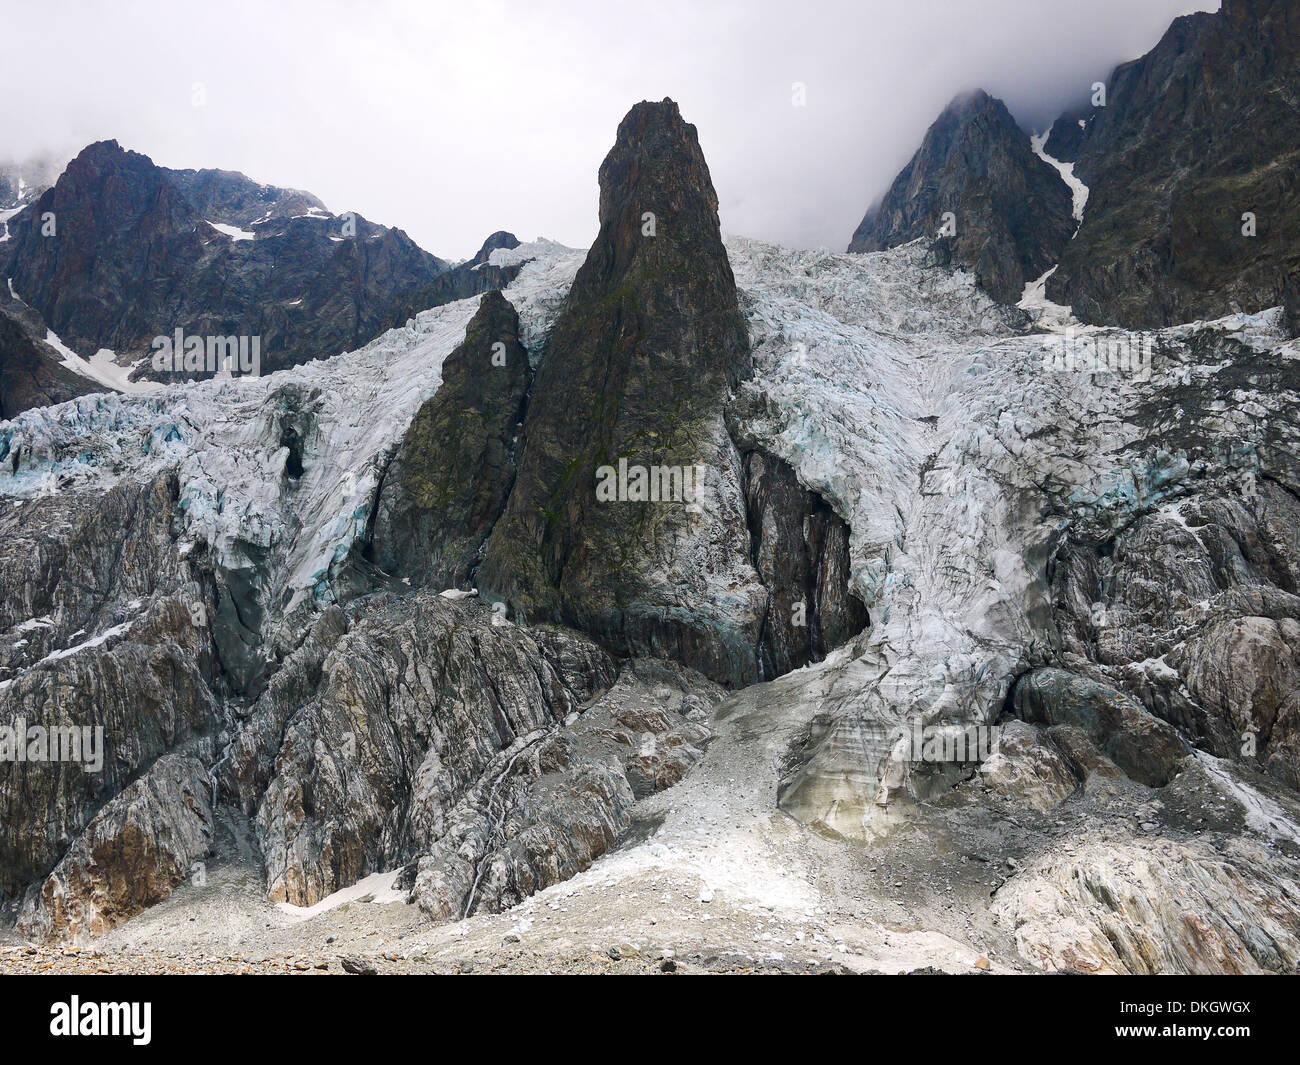 Glacier in the Mount Blanc complex, Val Veny, Alps - Stock Image